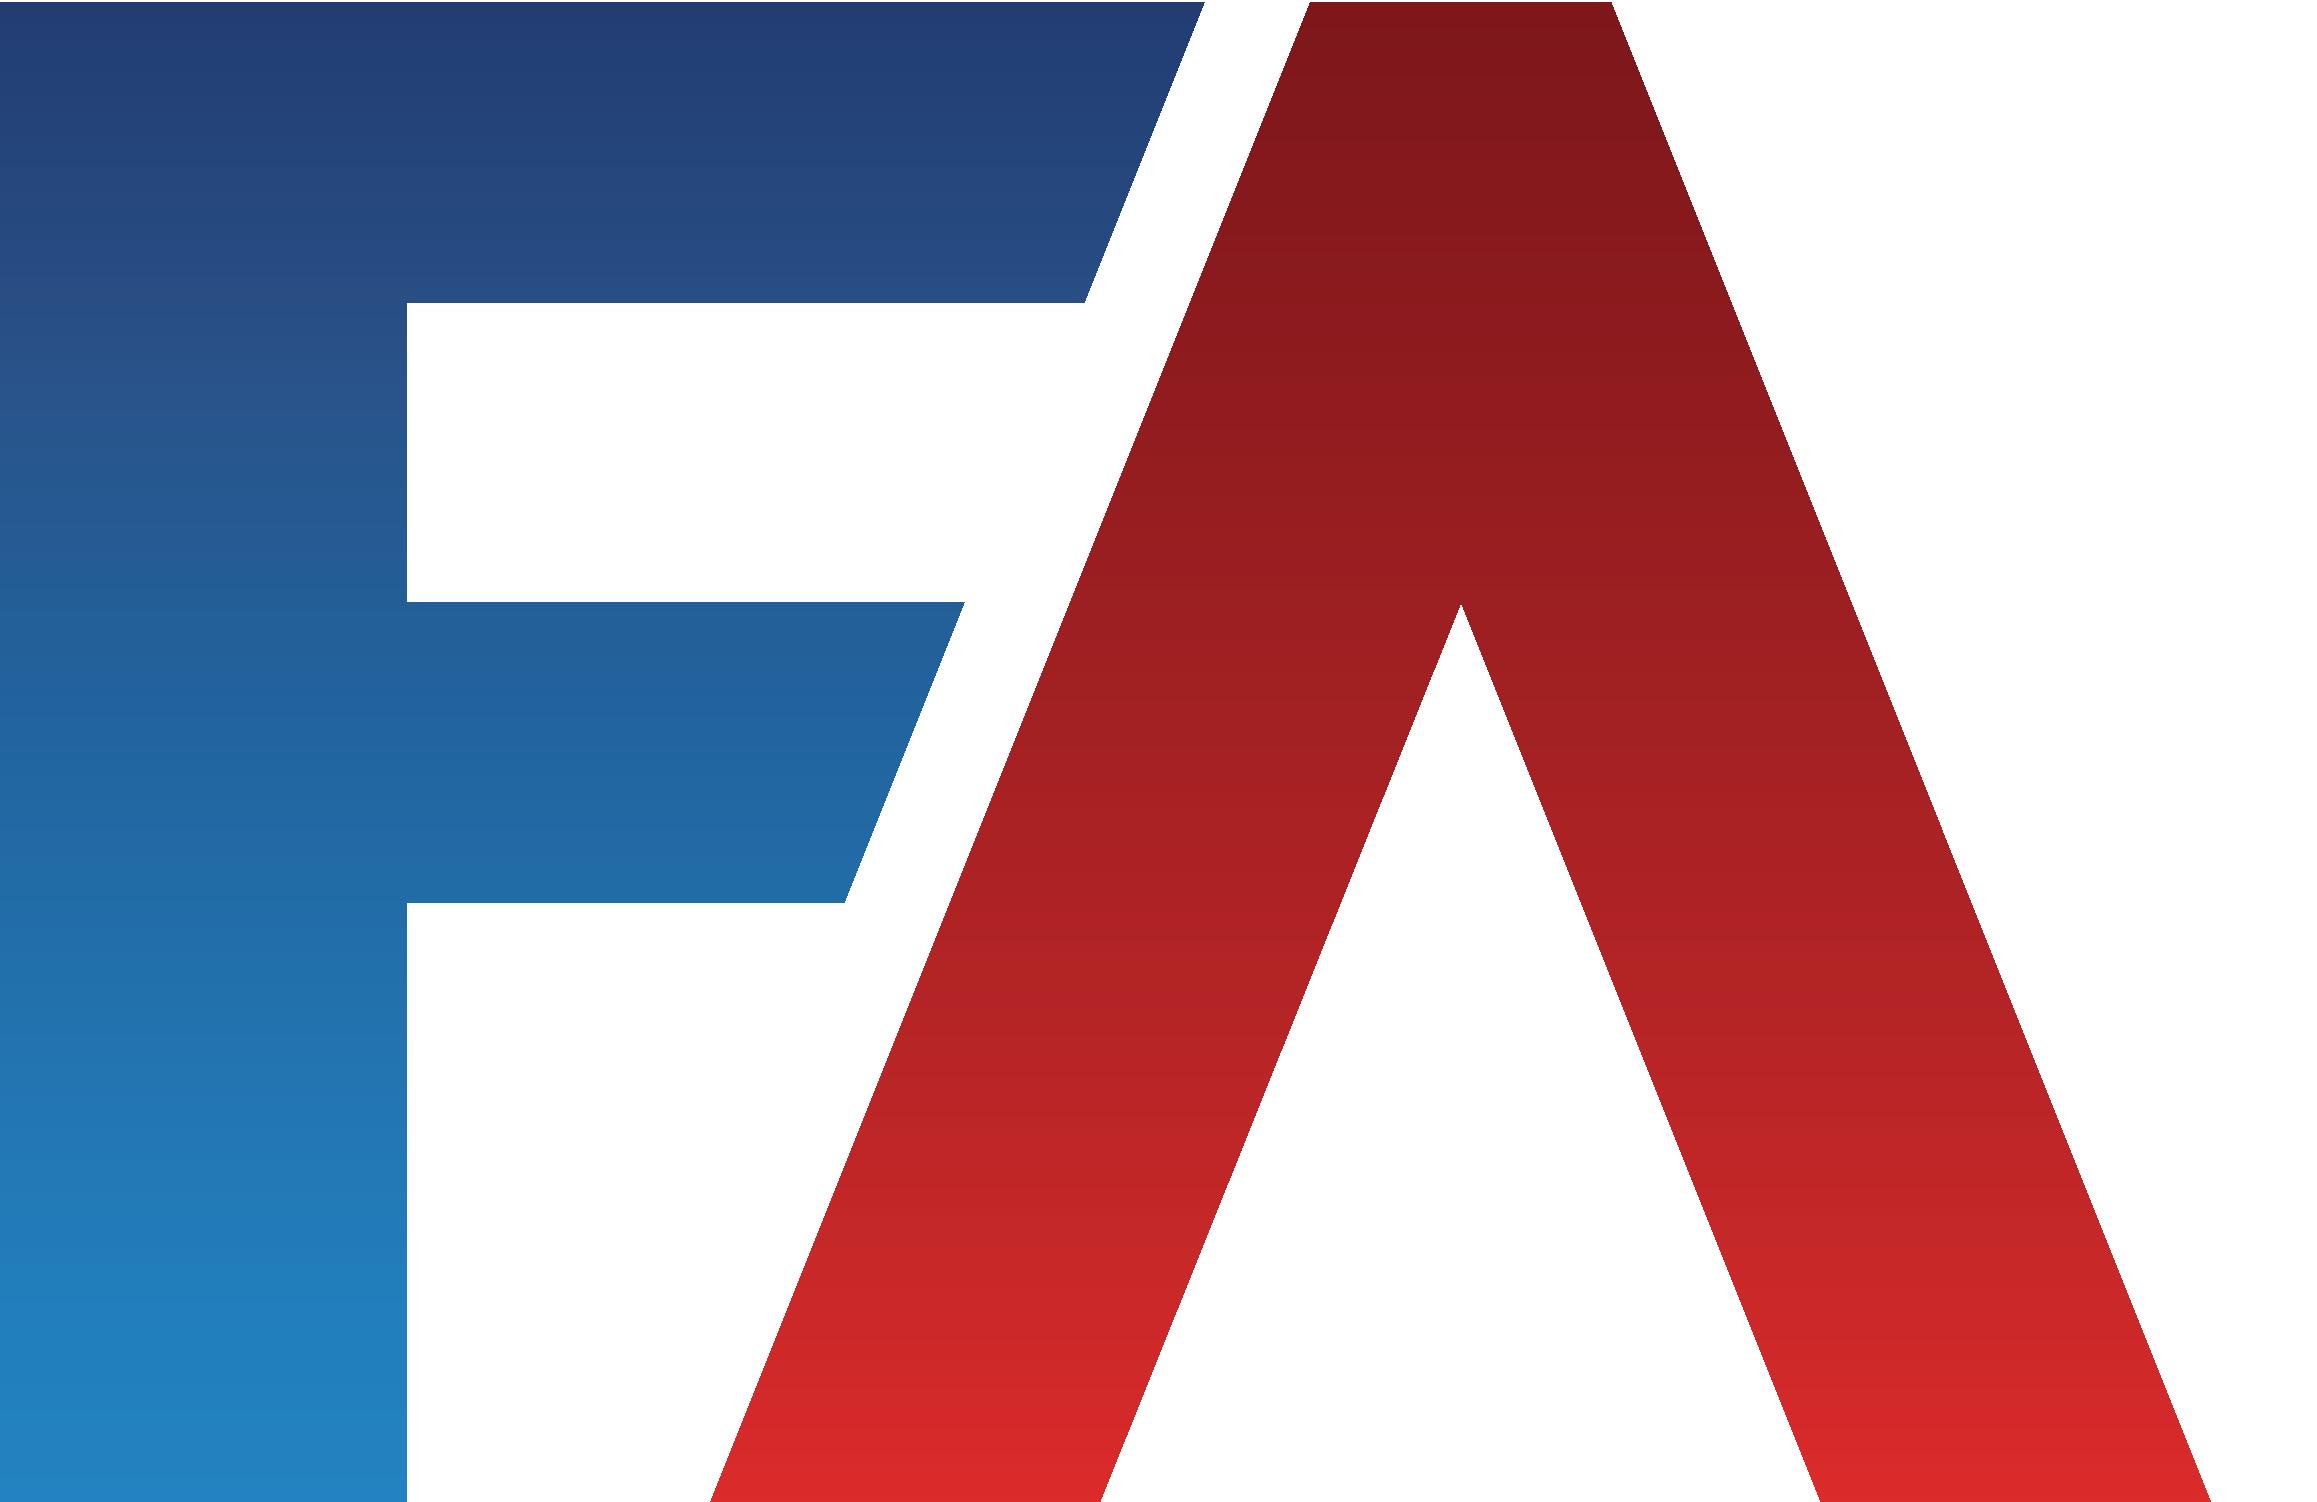 49ers | FantasyAlarm.com